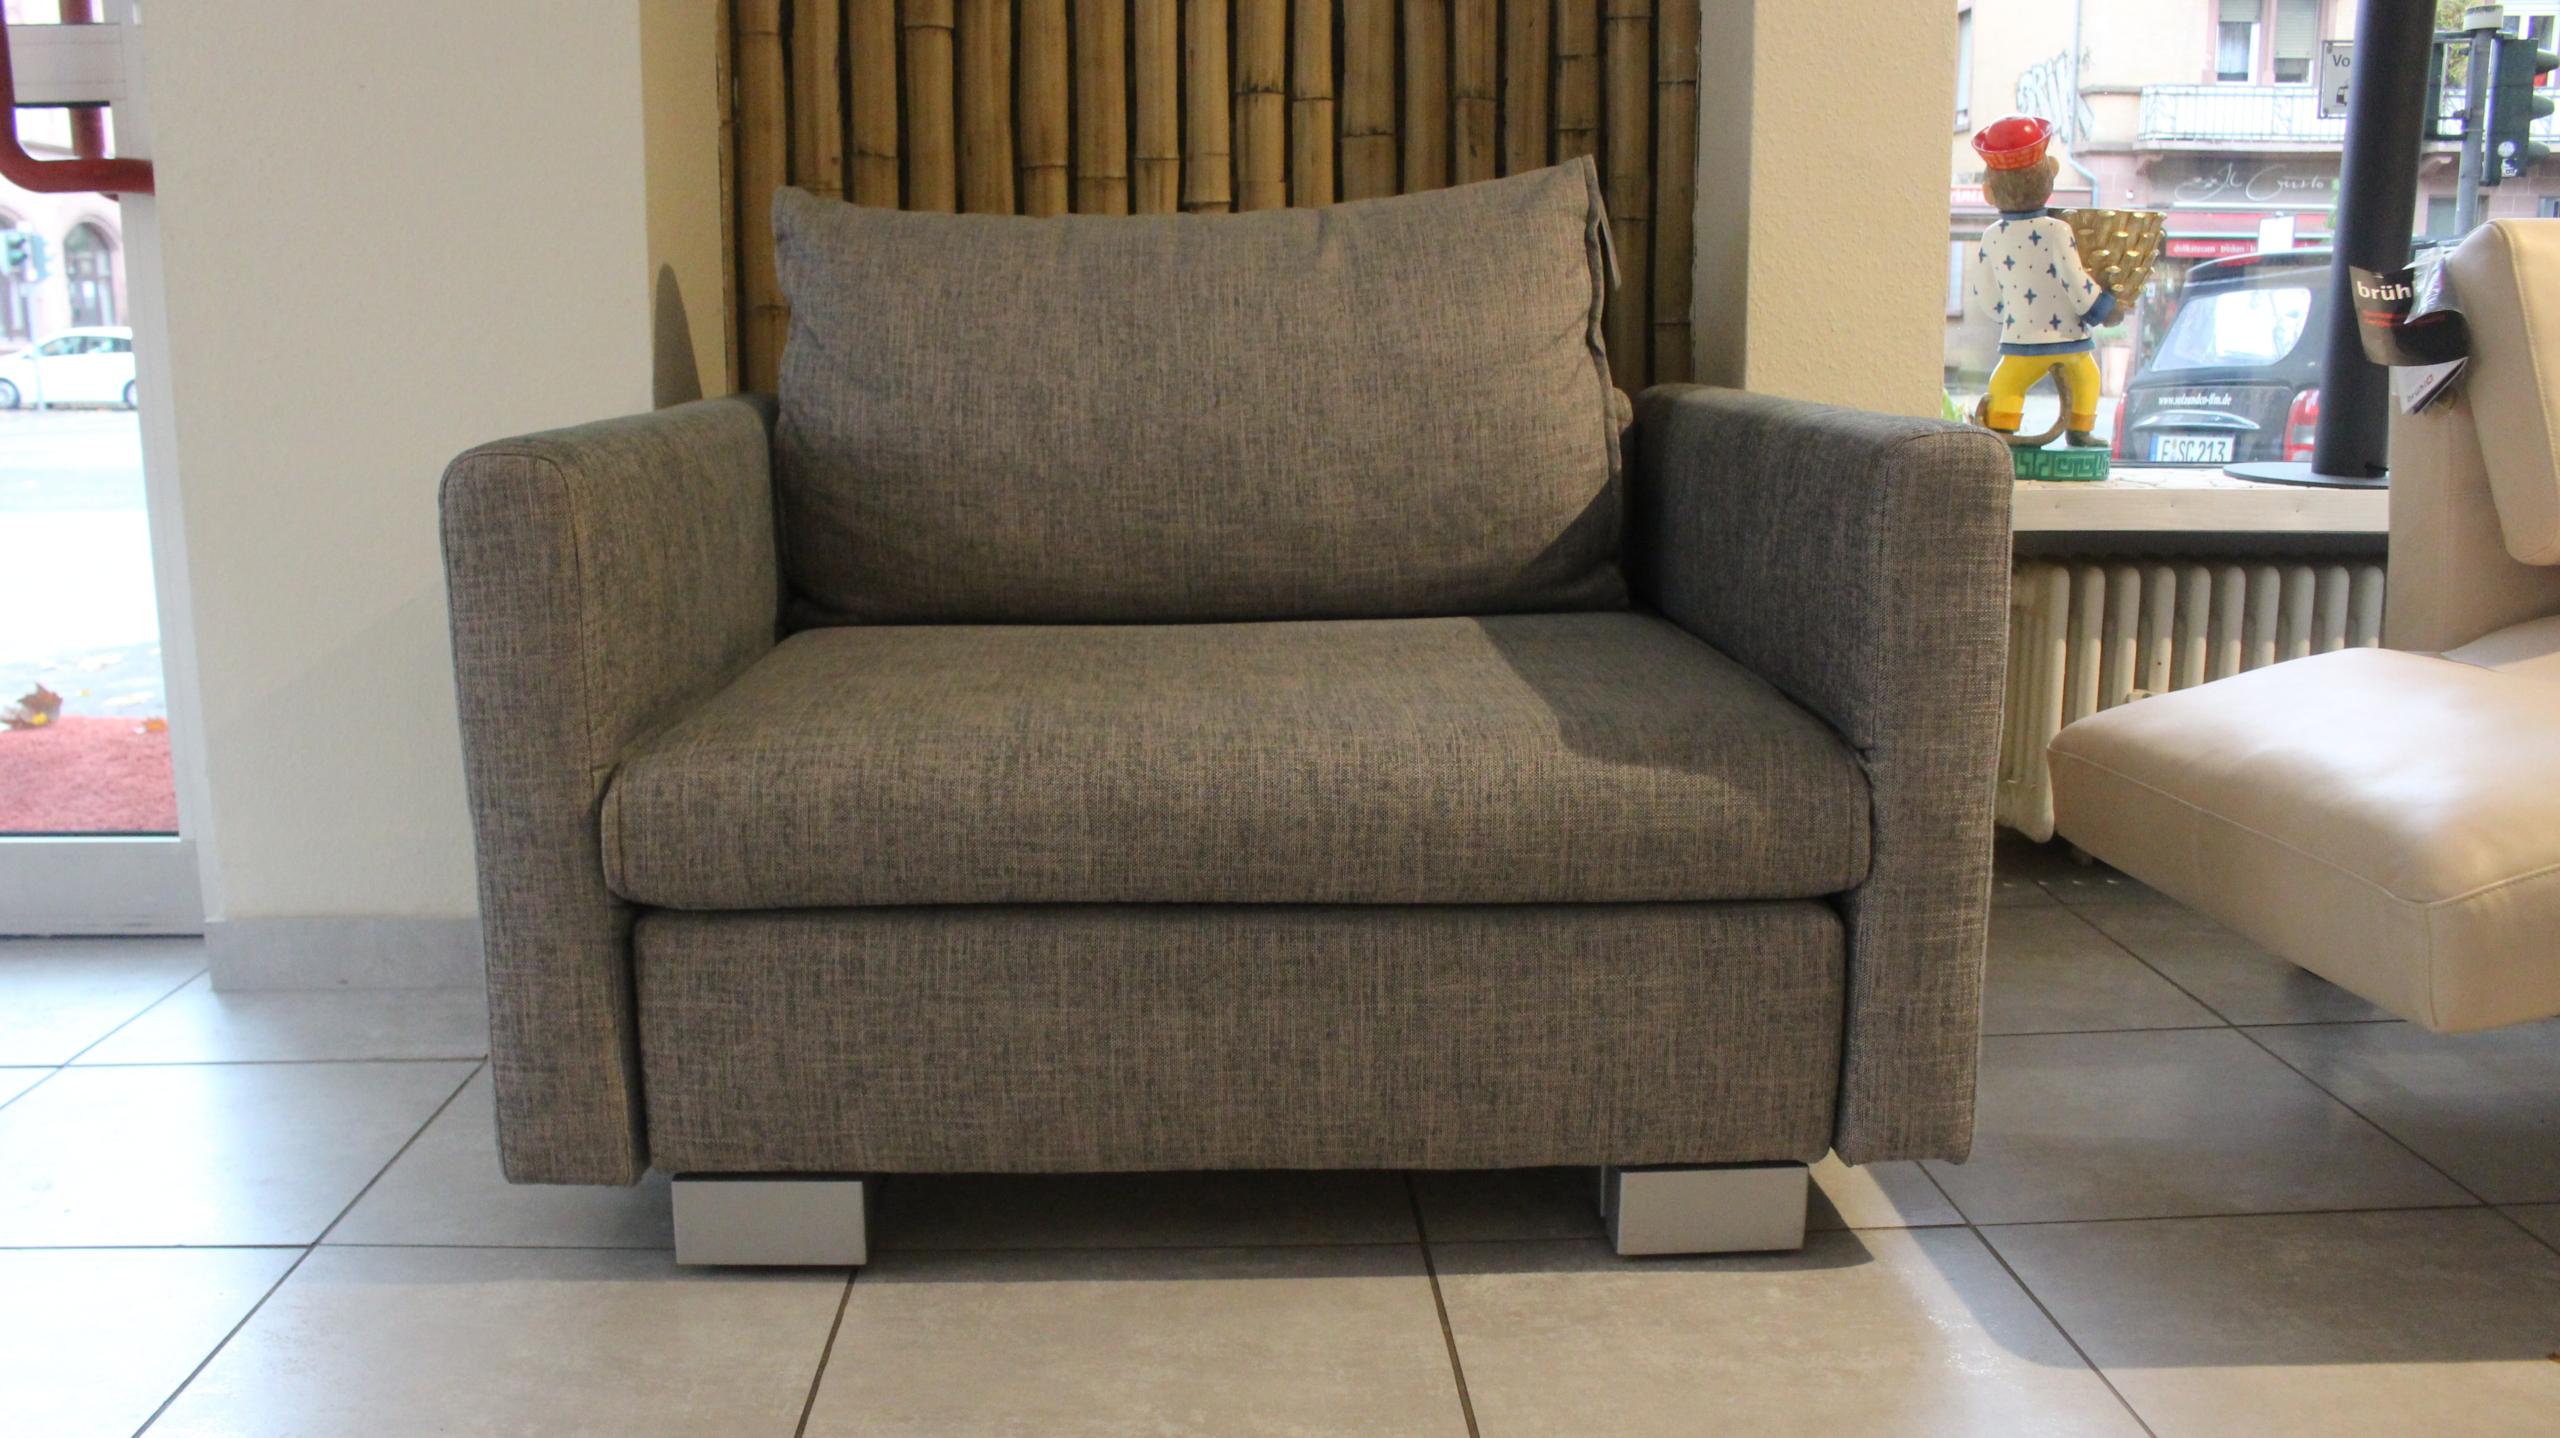 AKTION - Sofa & Co.